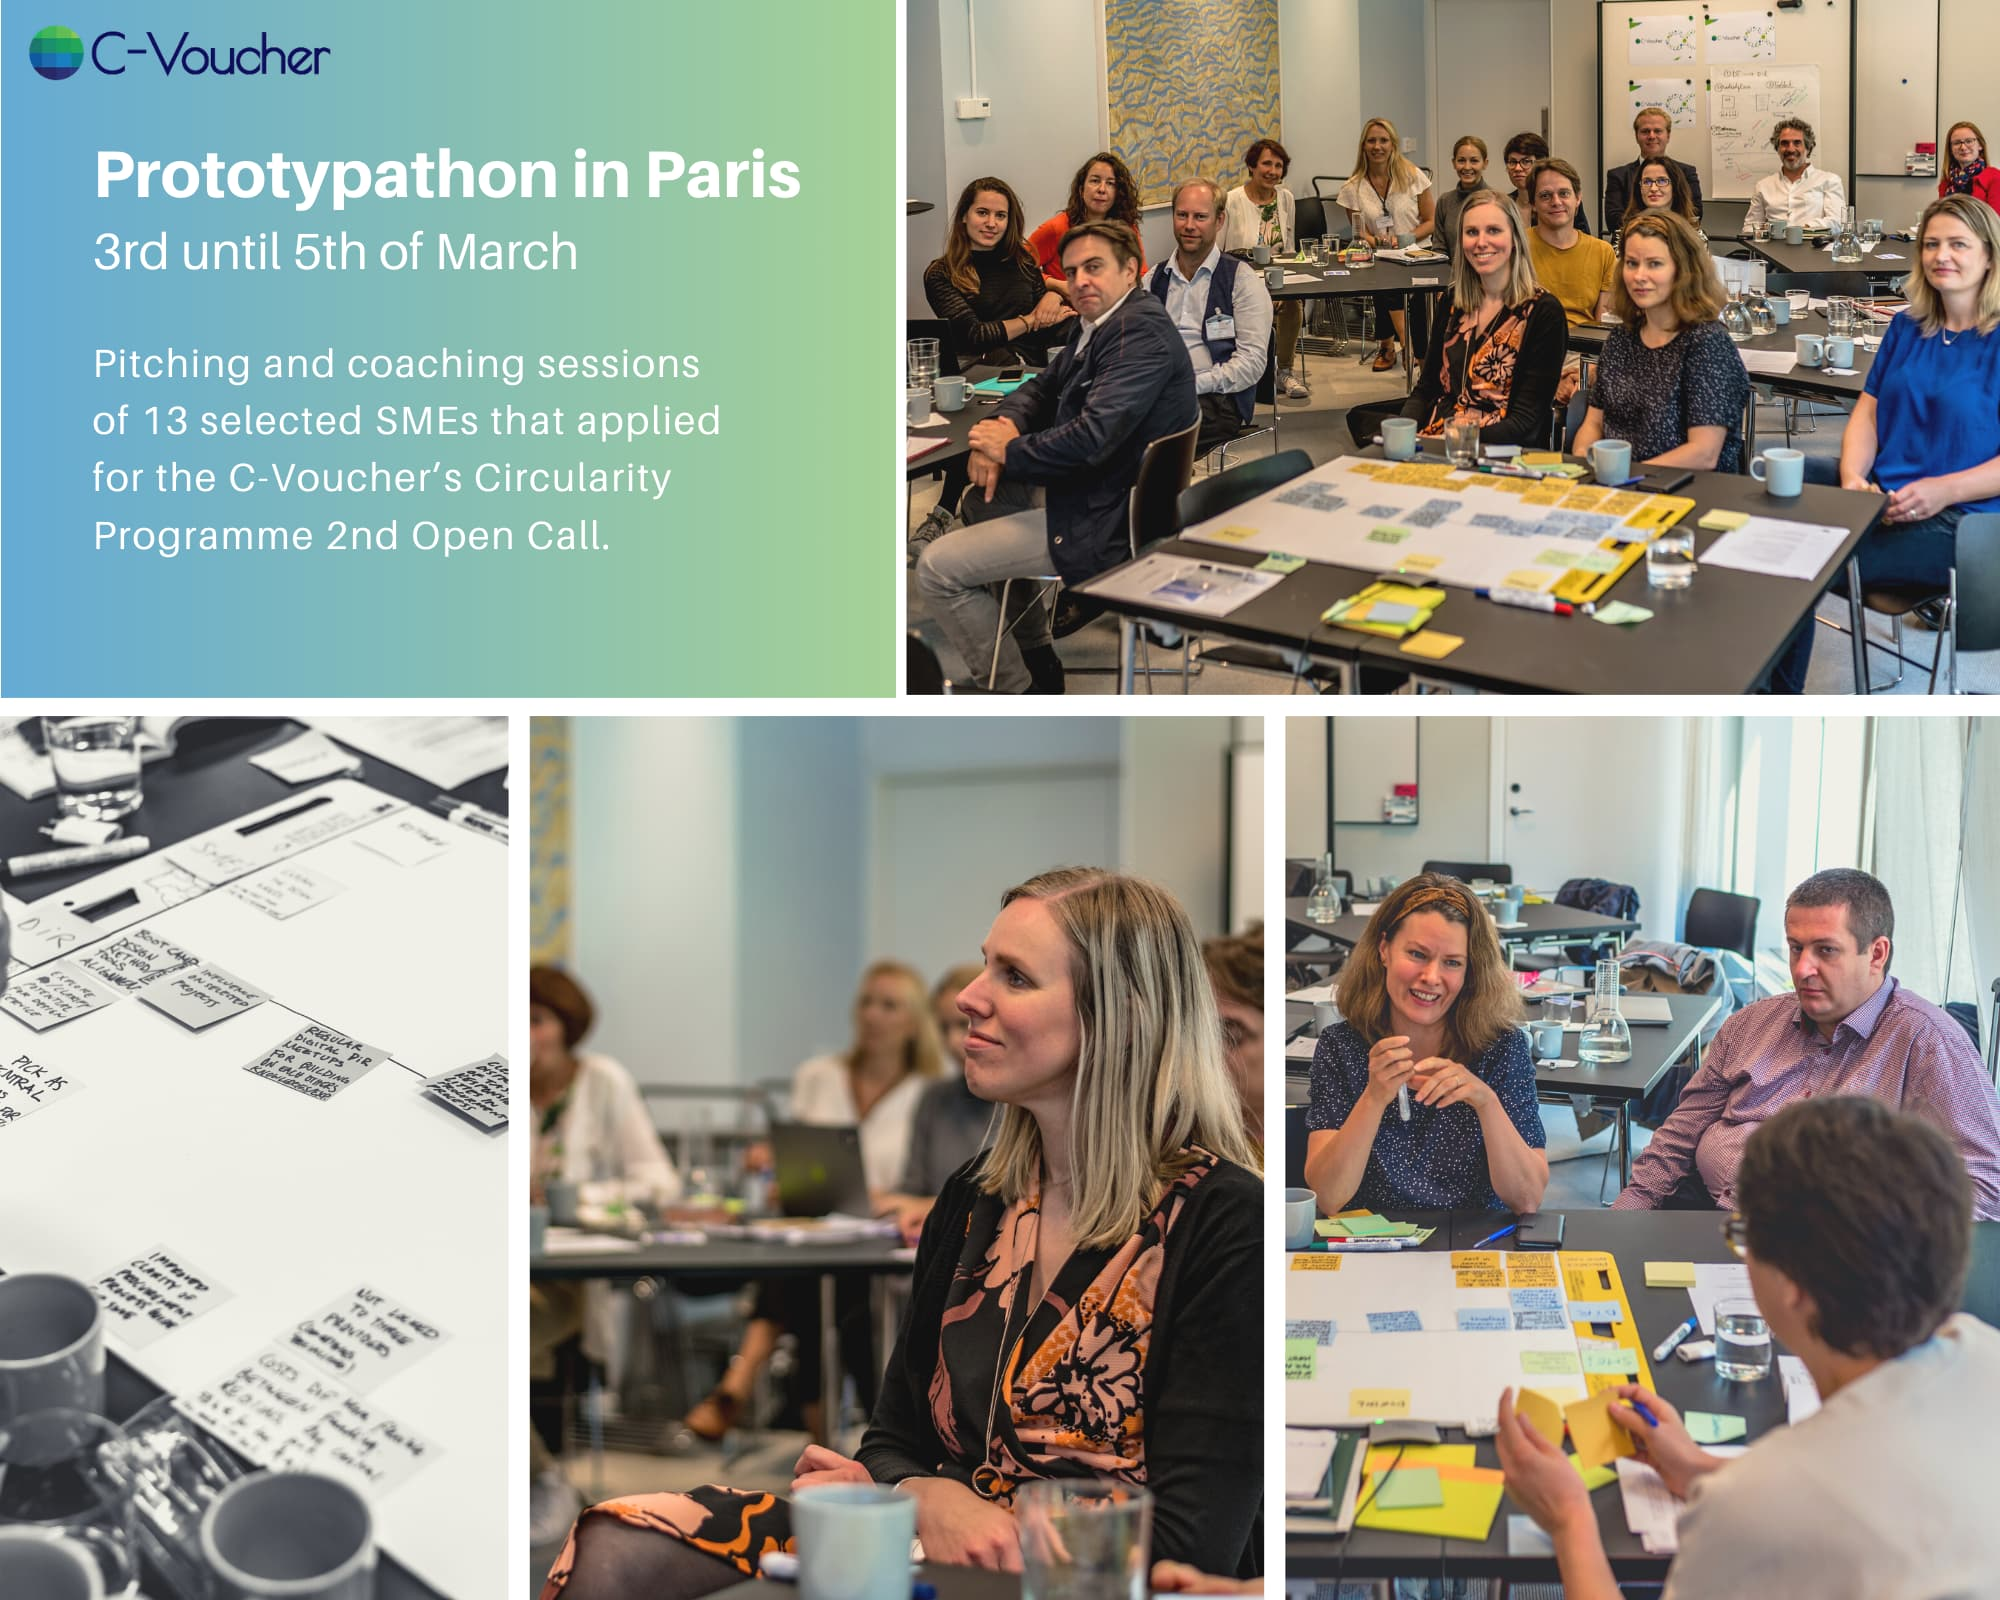 C-VoUCHER bootcamp in Paris, Prototypathon